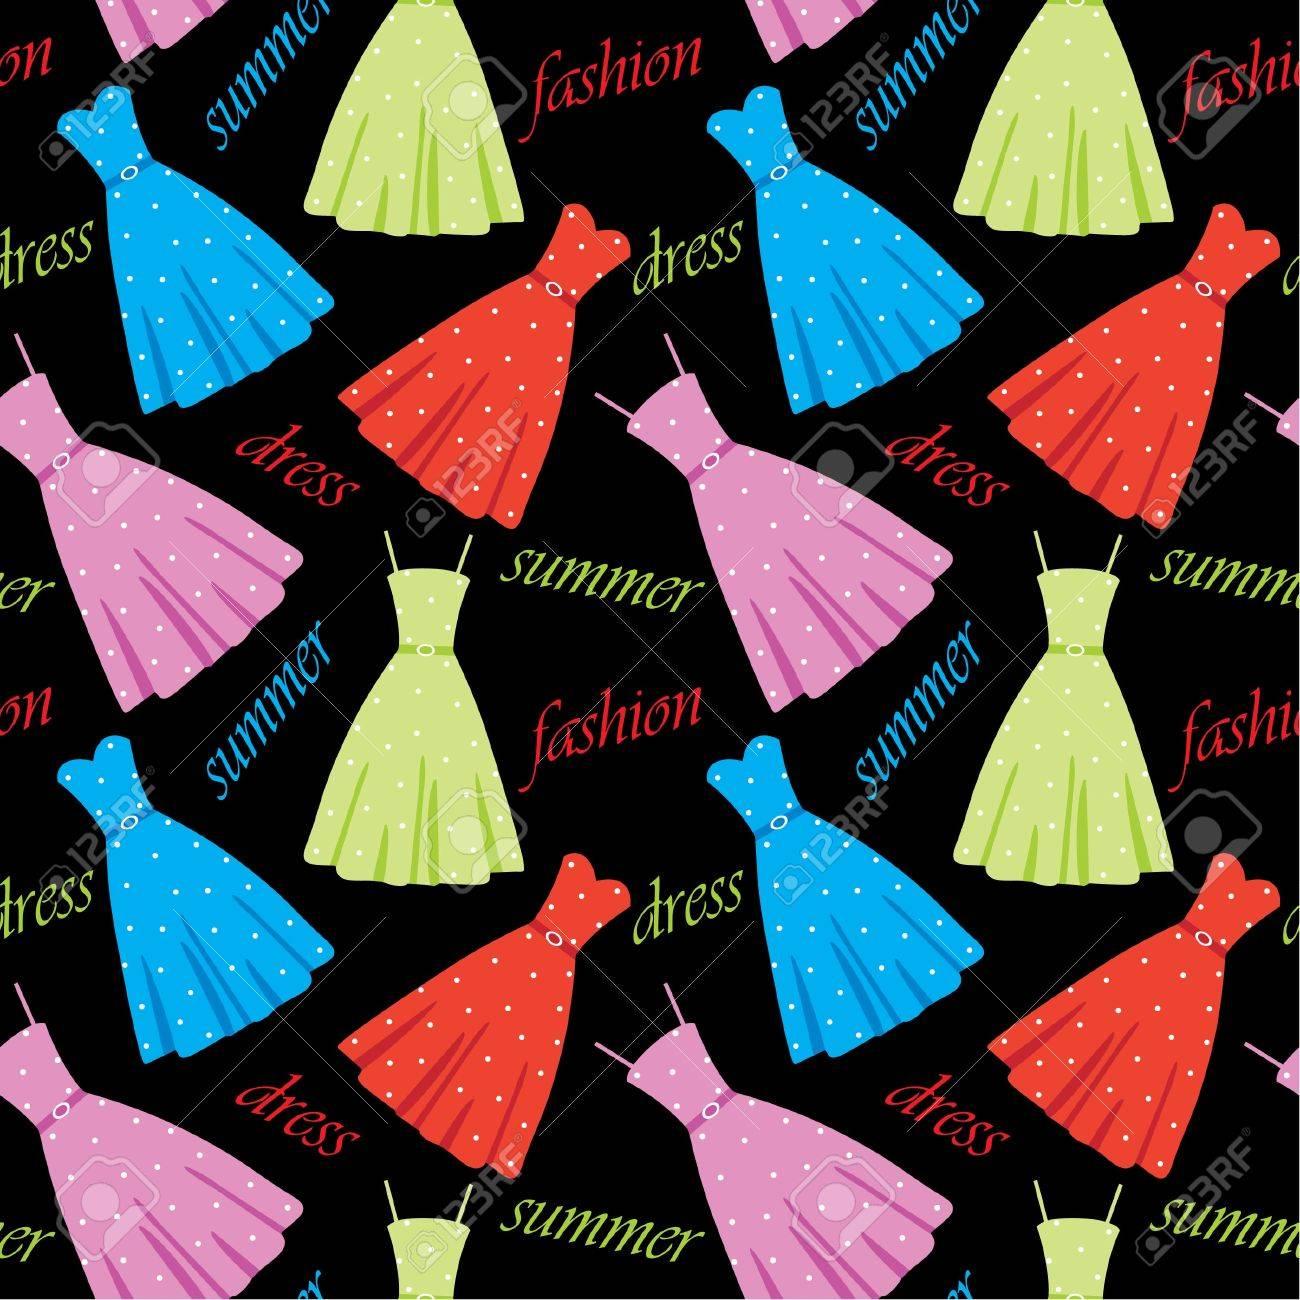 Seamless summer dresses pattern Stock Vector - 14446550